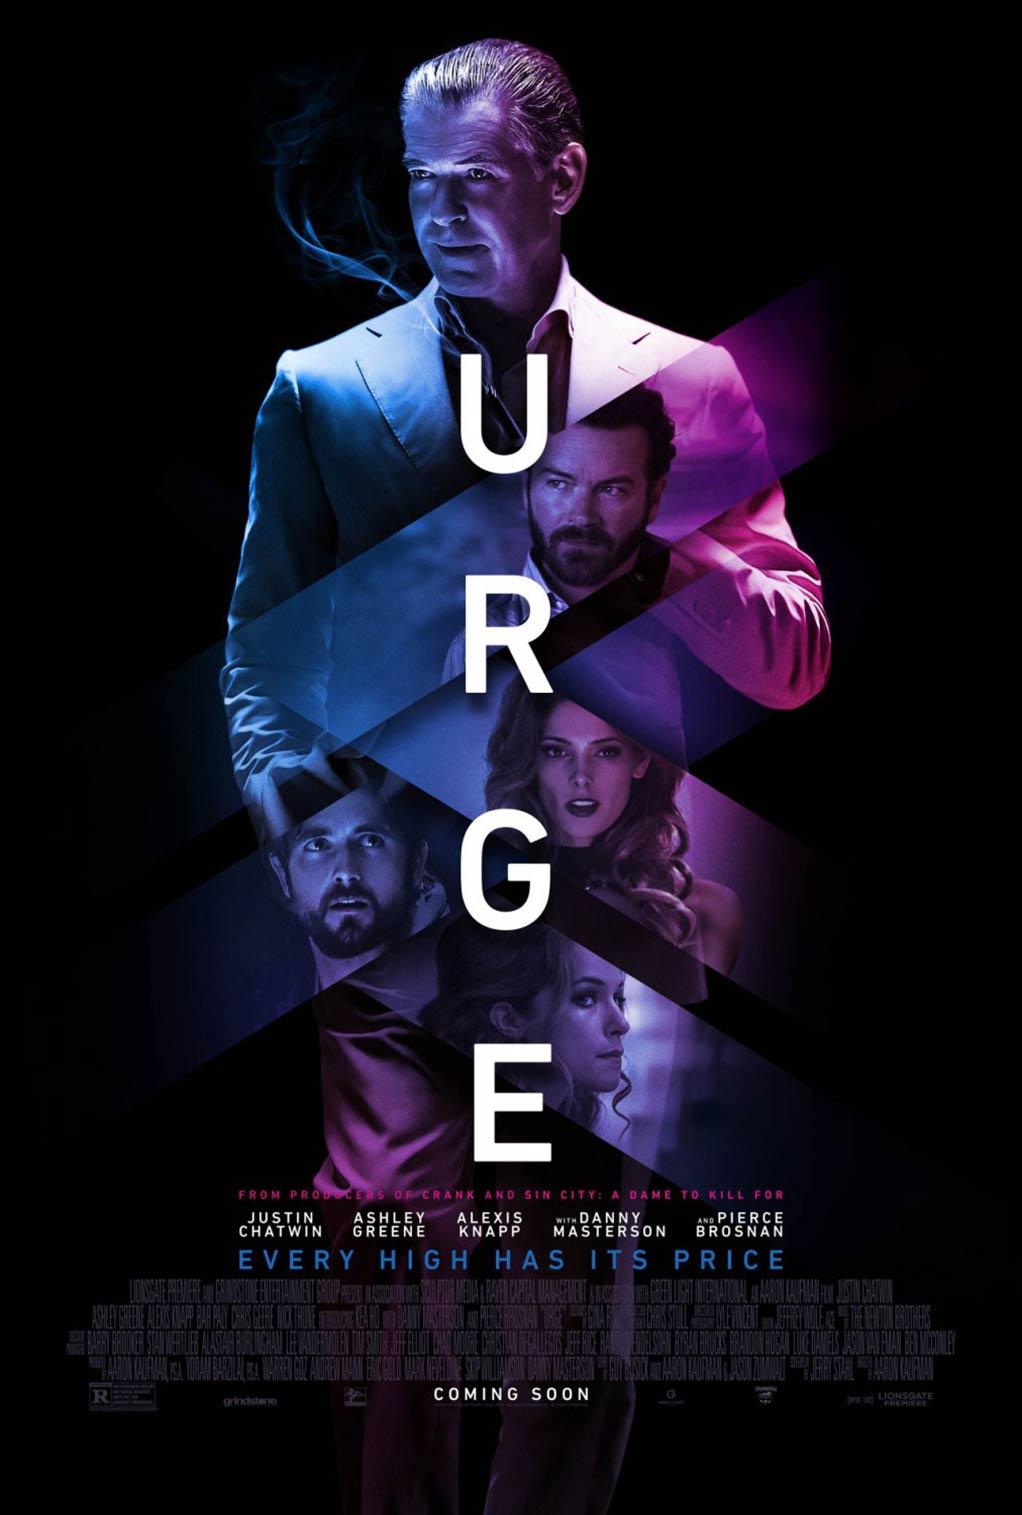 Urge Poster #1